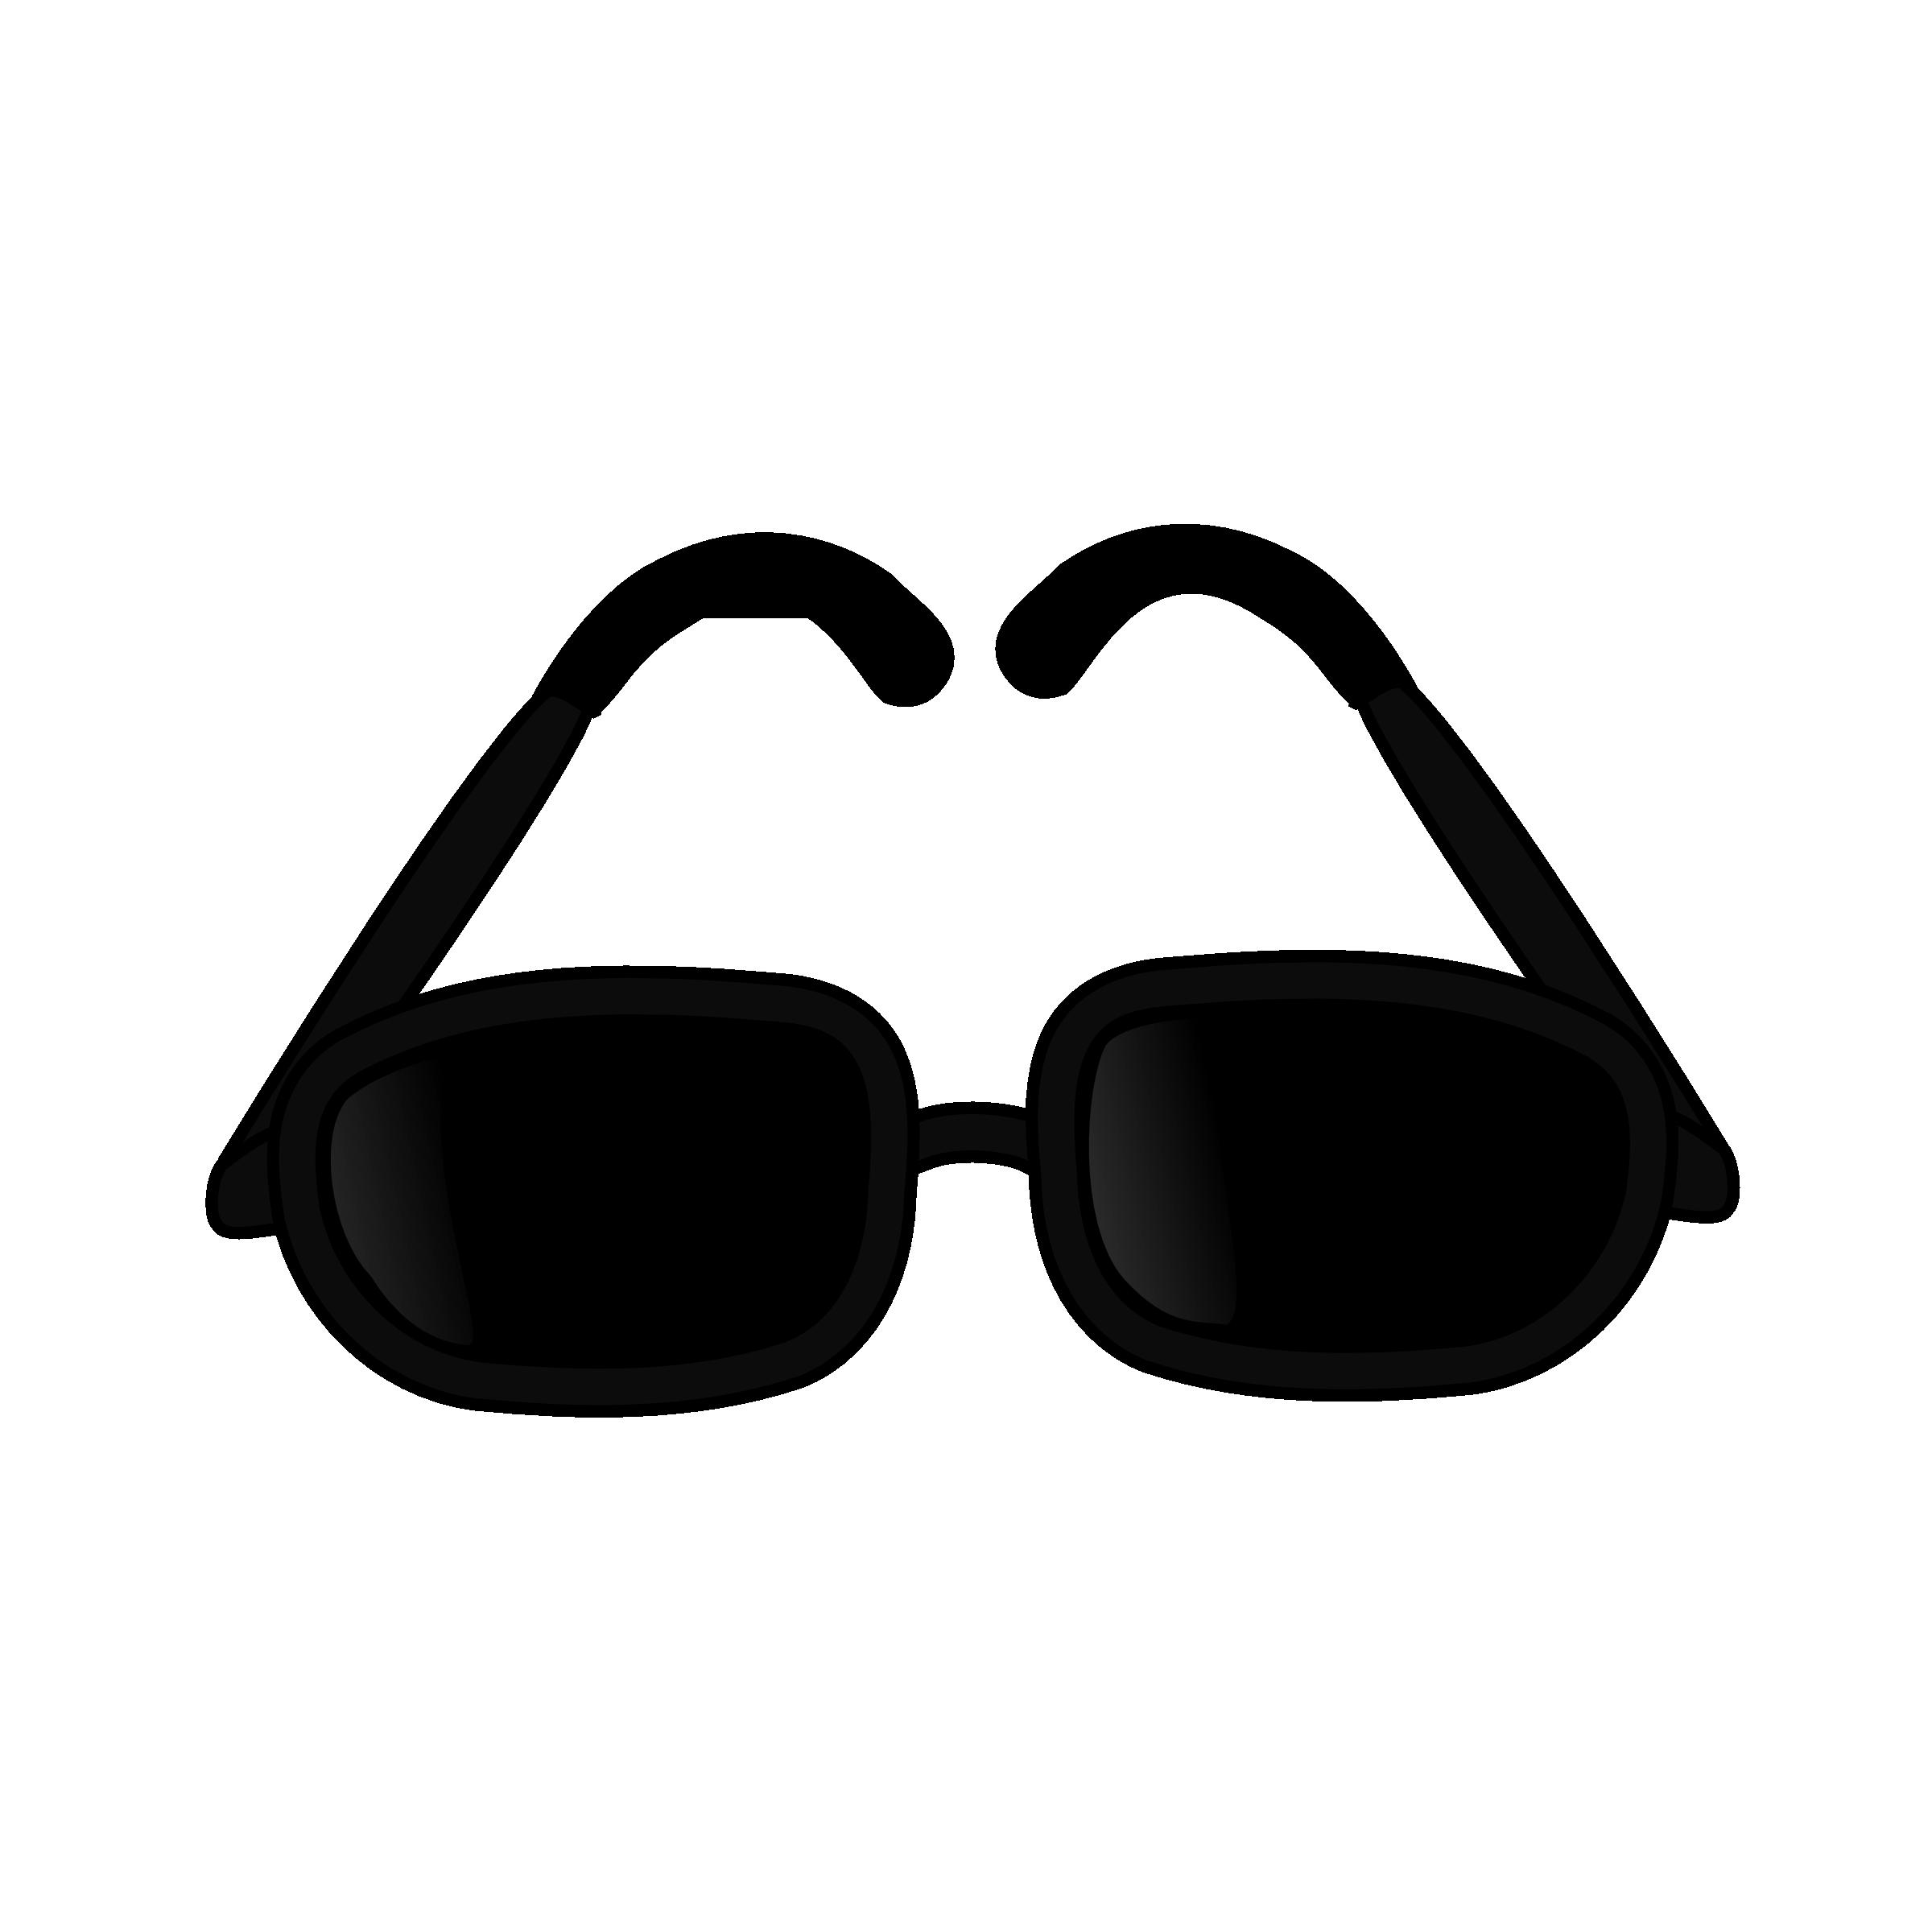 Vision clipart bifocal glass. Eyeglasses panda free images